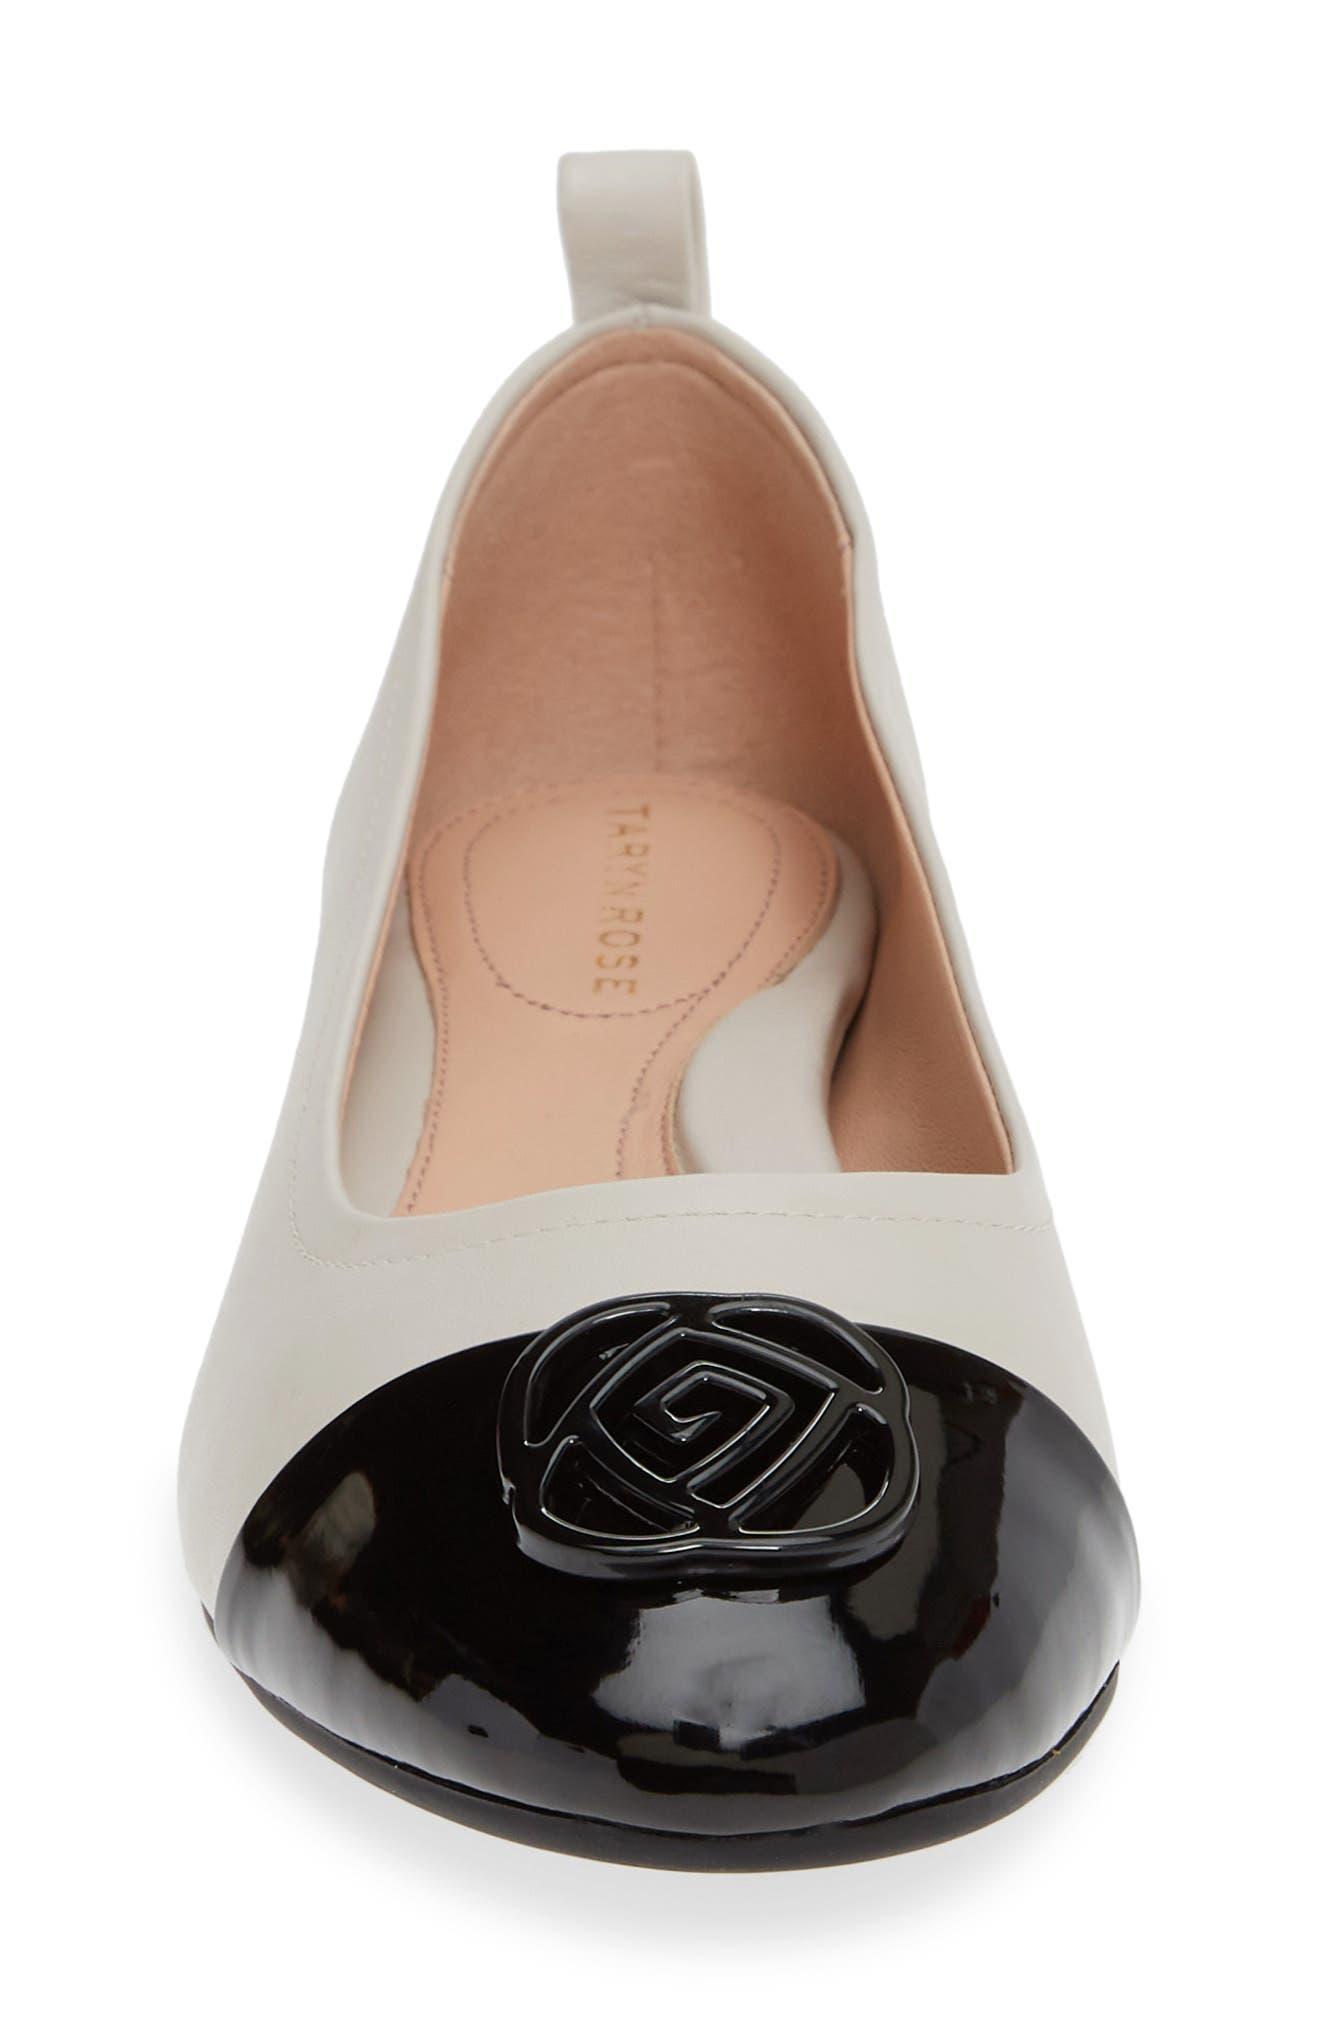 TARYN ROSE, Penelope Cap Toe Ballet Flat, Alternate thumbnail 4, color, CHALK NAPPA LEATHER